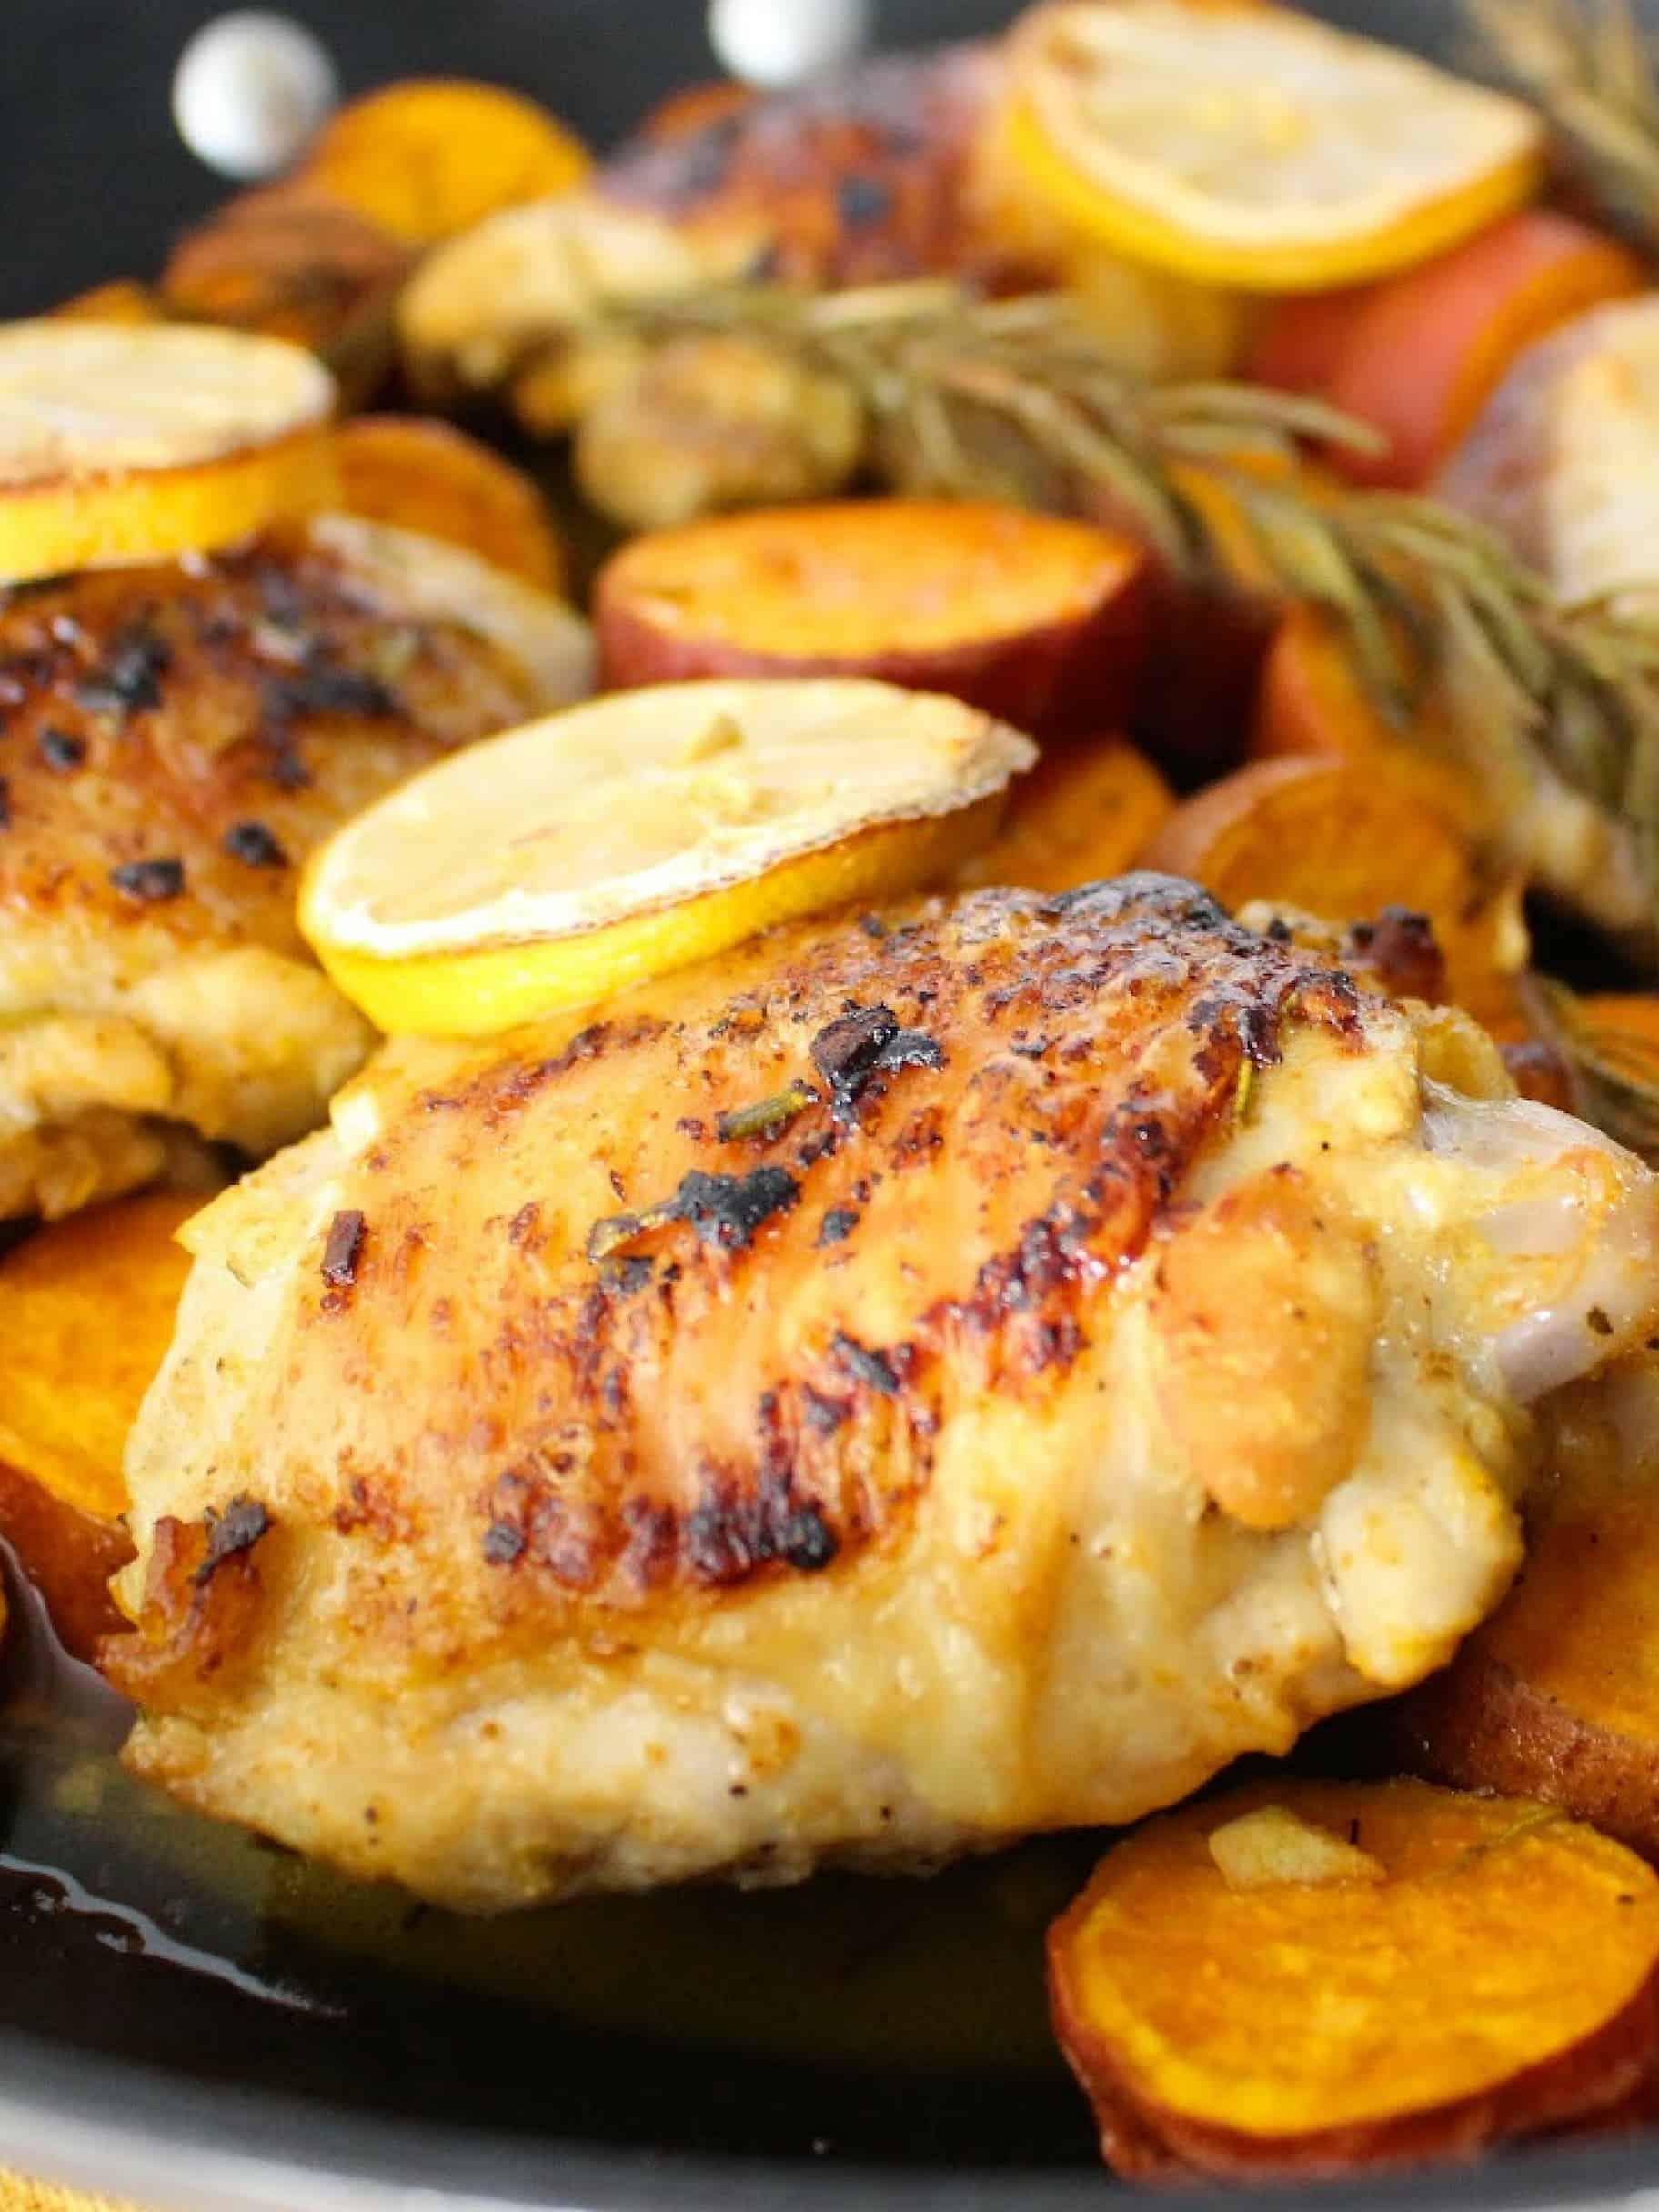 Lemon Rosemary chicken with sweet potatoes